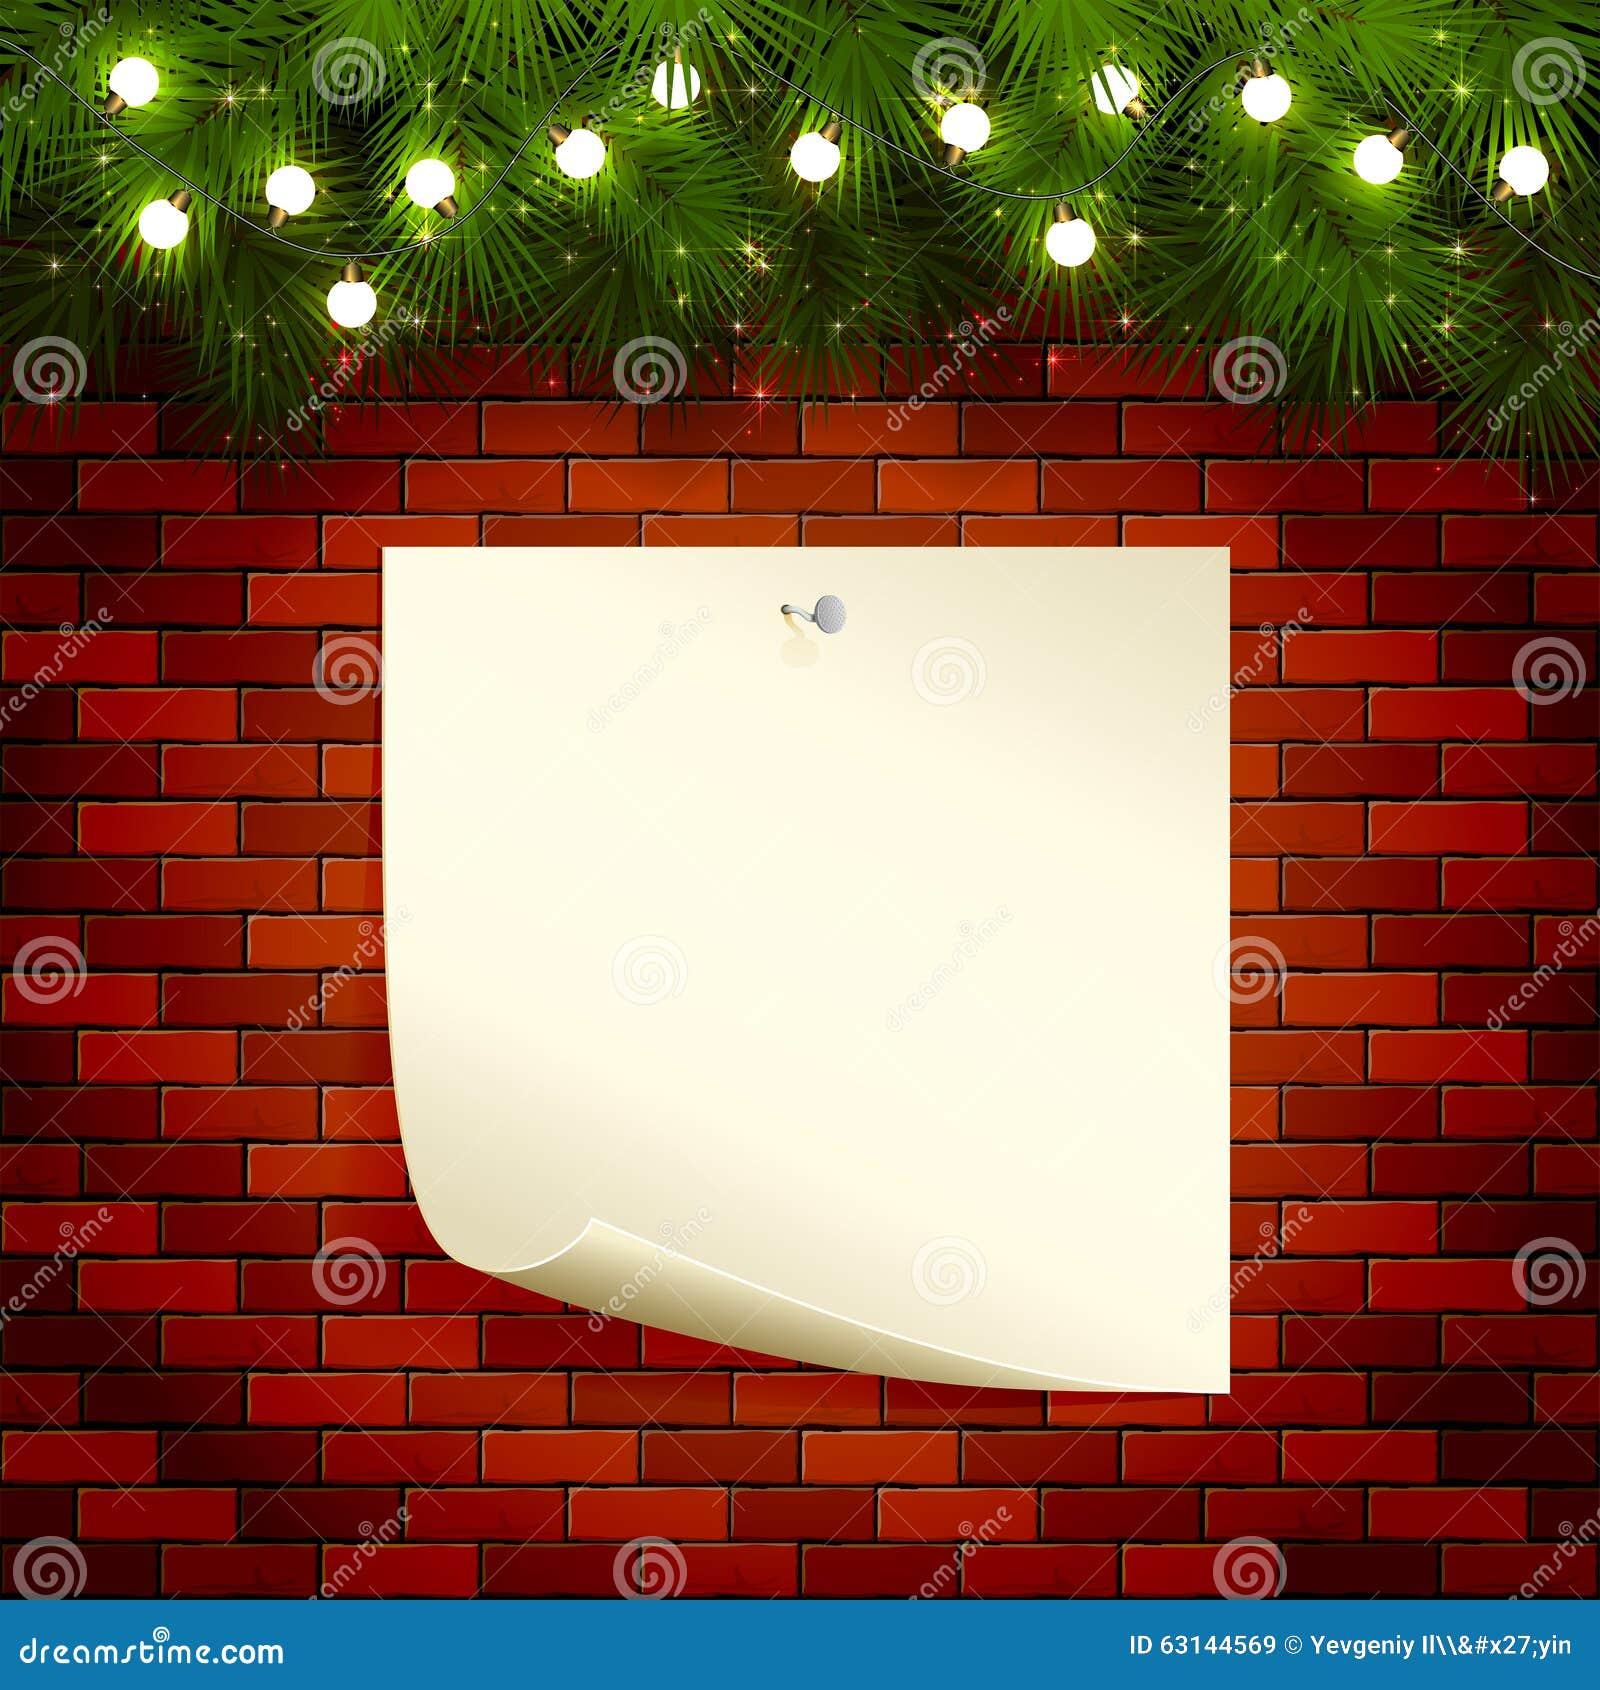 Christmas Lights And Paper On Brick Wall Stock Vector - Image: 63144569